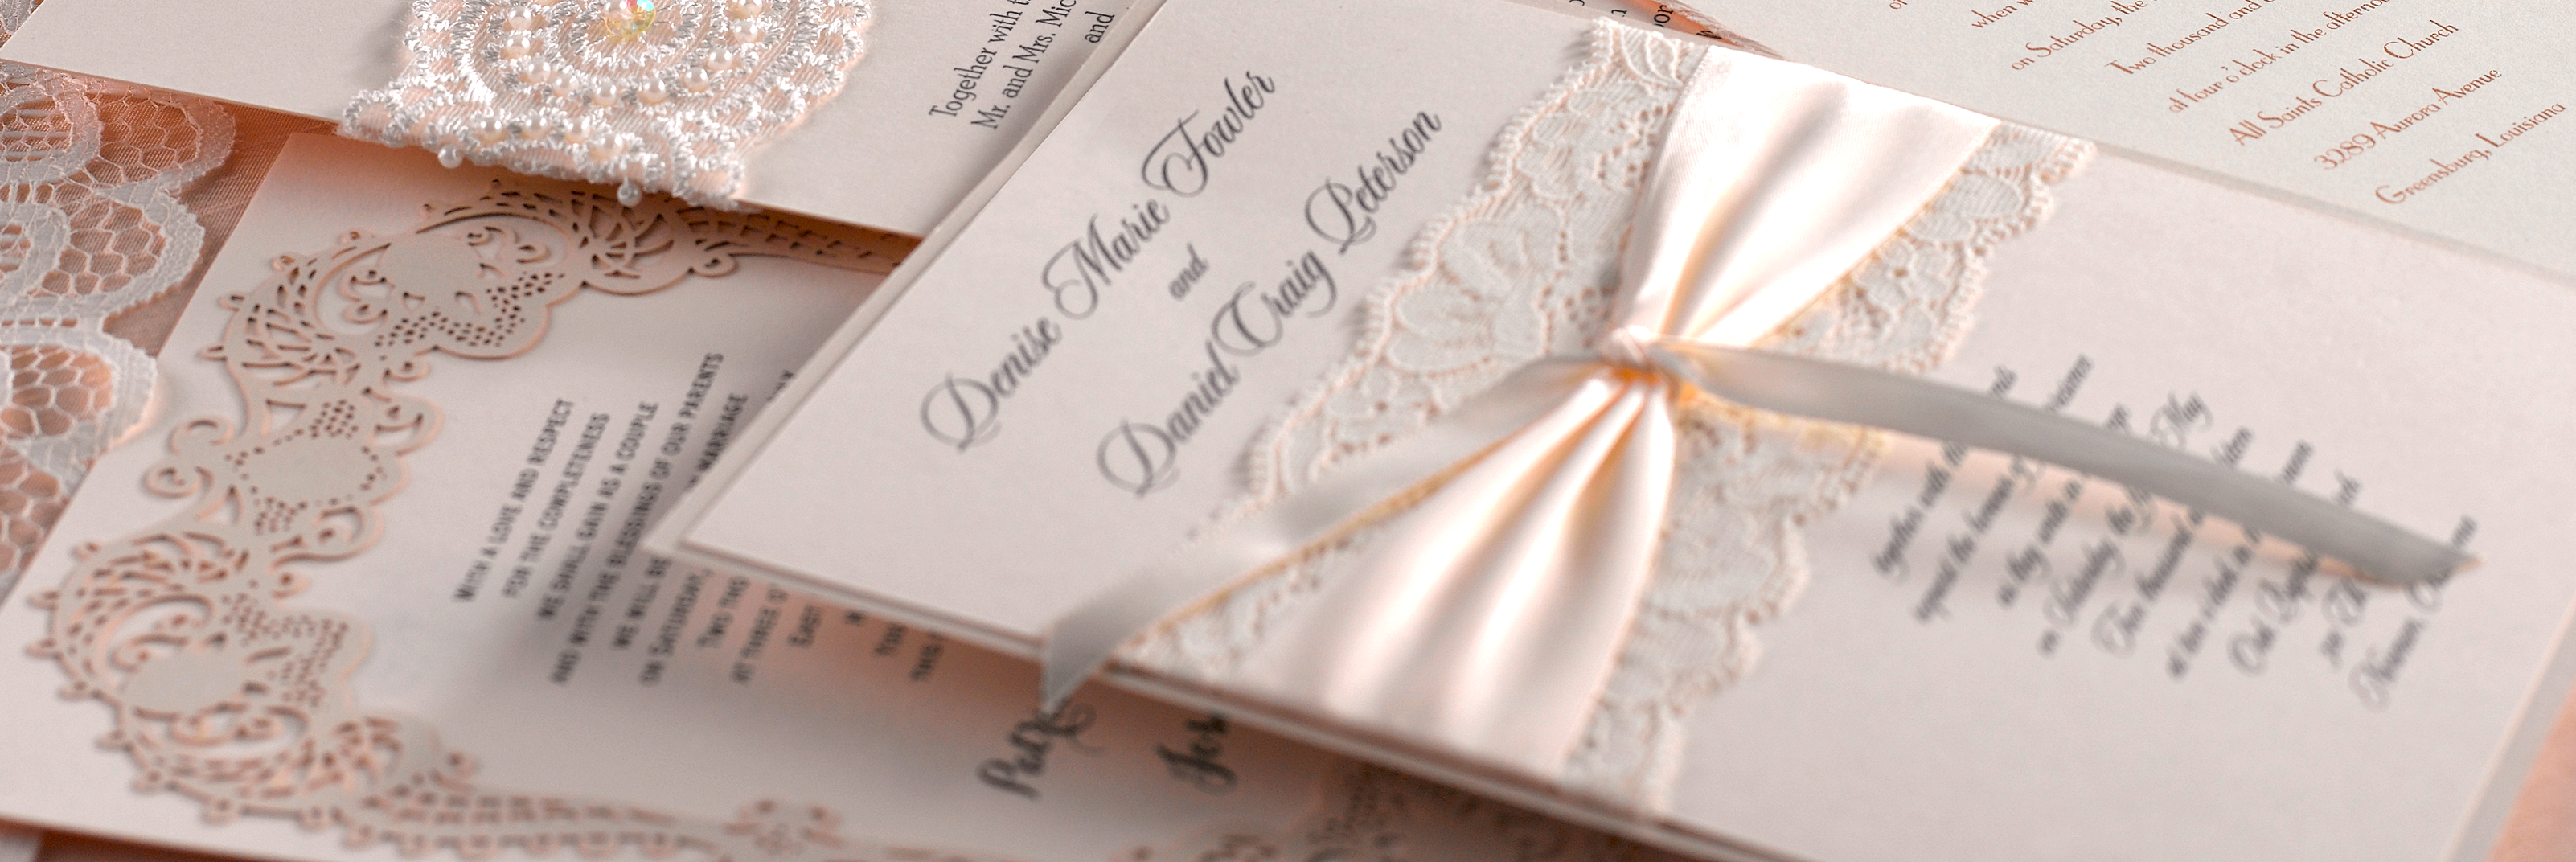 busy brides wedding invitations, new jersey wedding invitations,, Wedding invitations